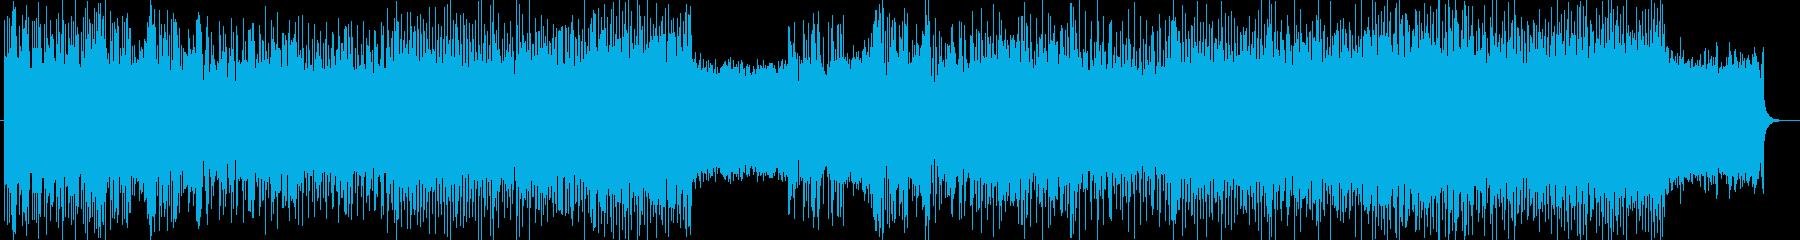 「HR/HM」「DARK」BGM266の再生済みの波形